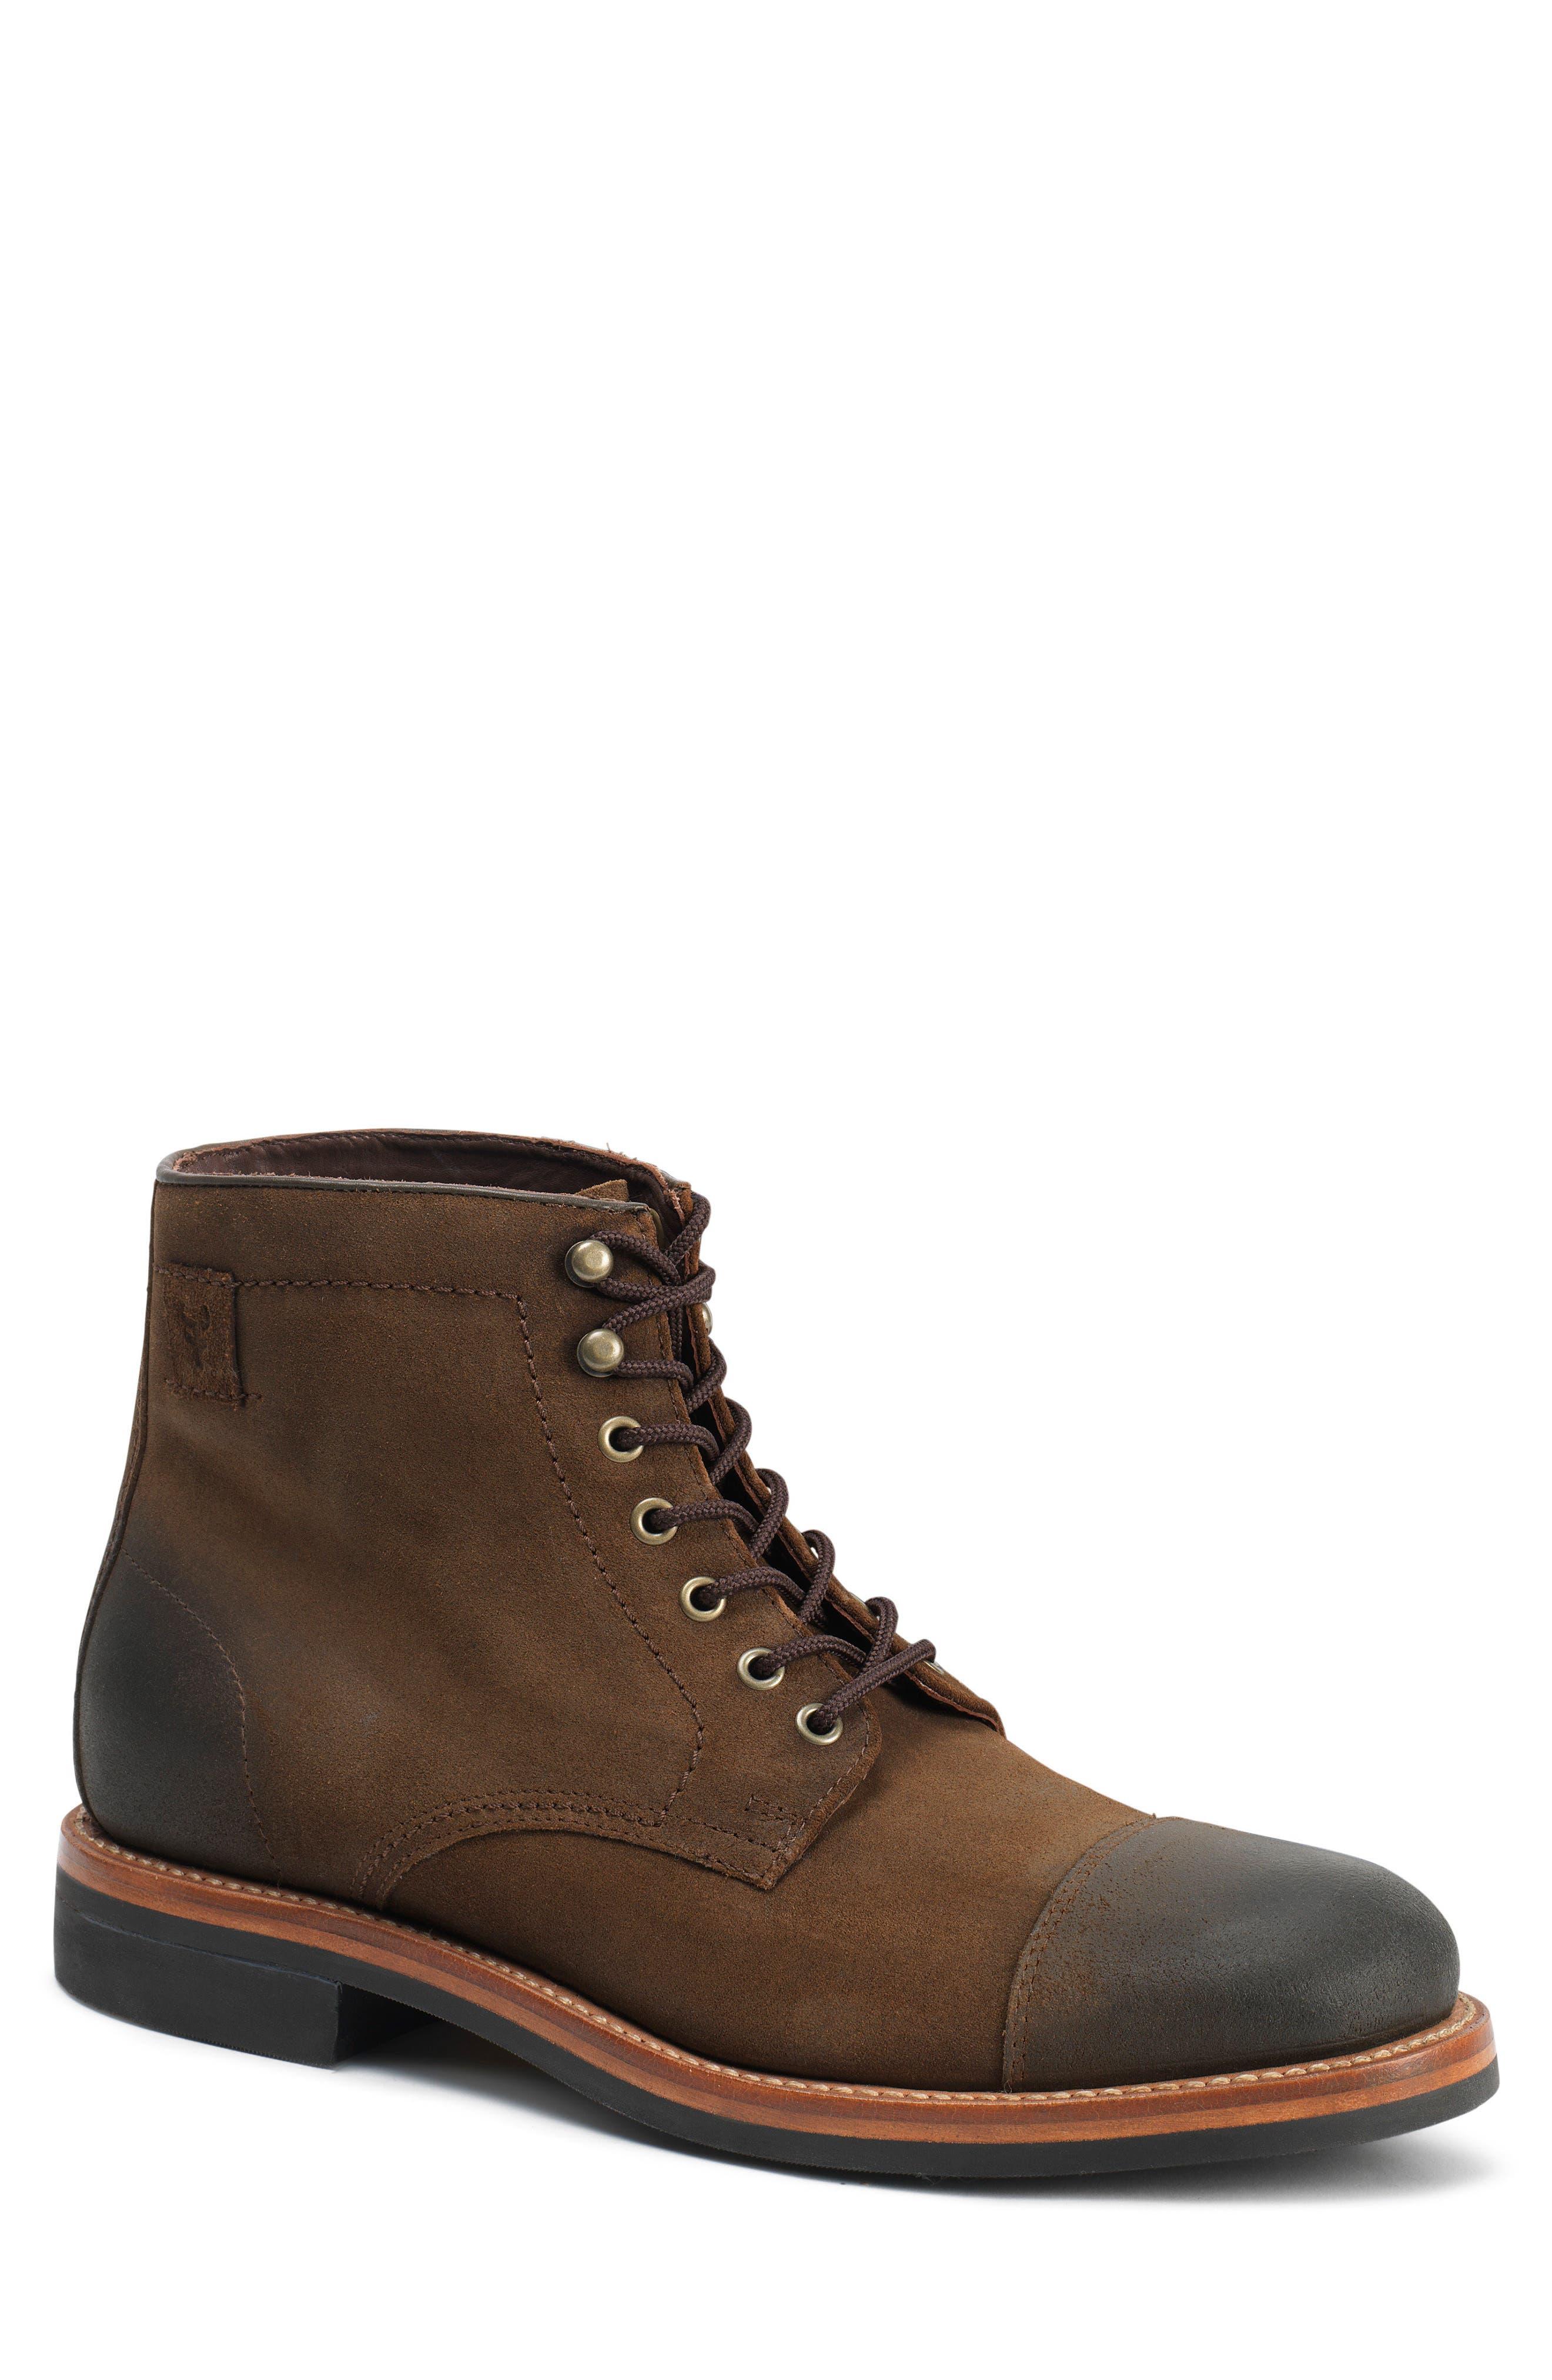 Ike Plain Toe Boot,                             Main thumbnail 1, color,                             200